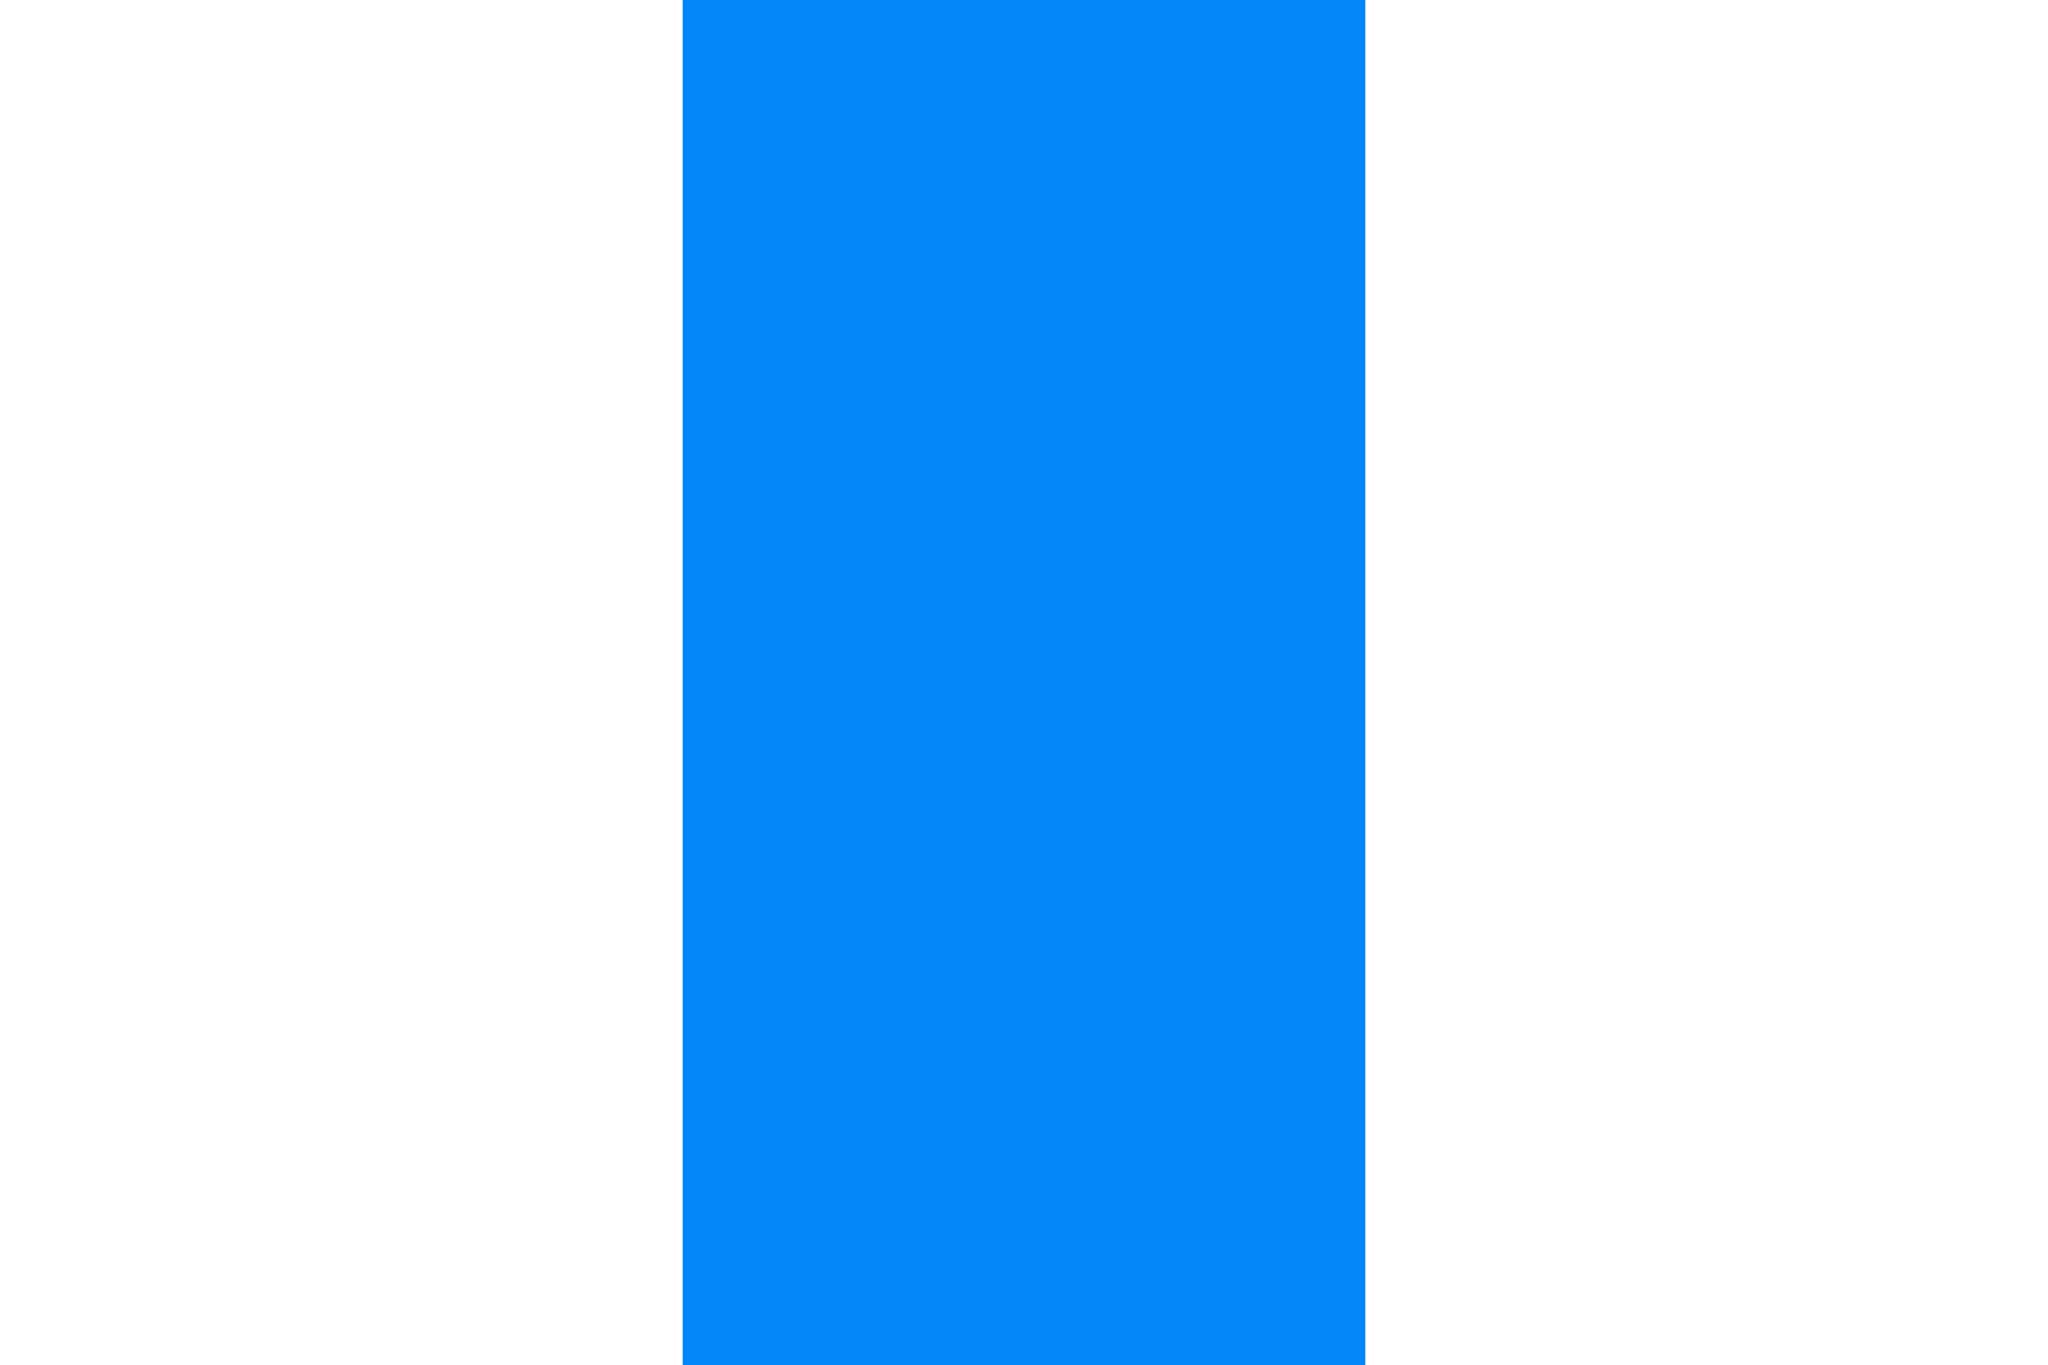 Gravir-flag.png